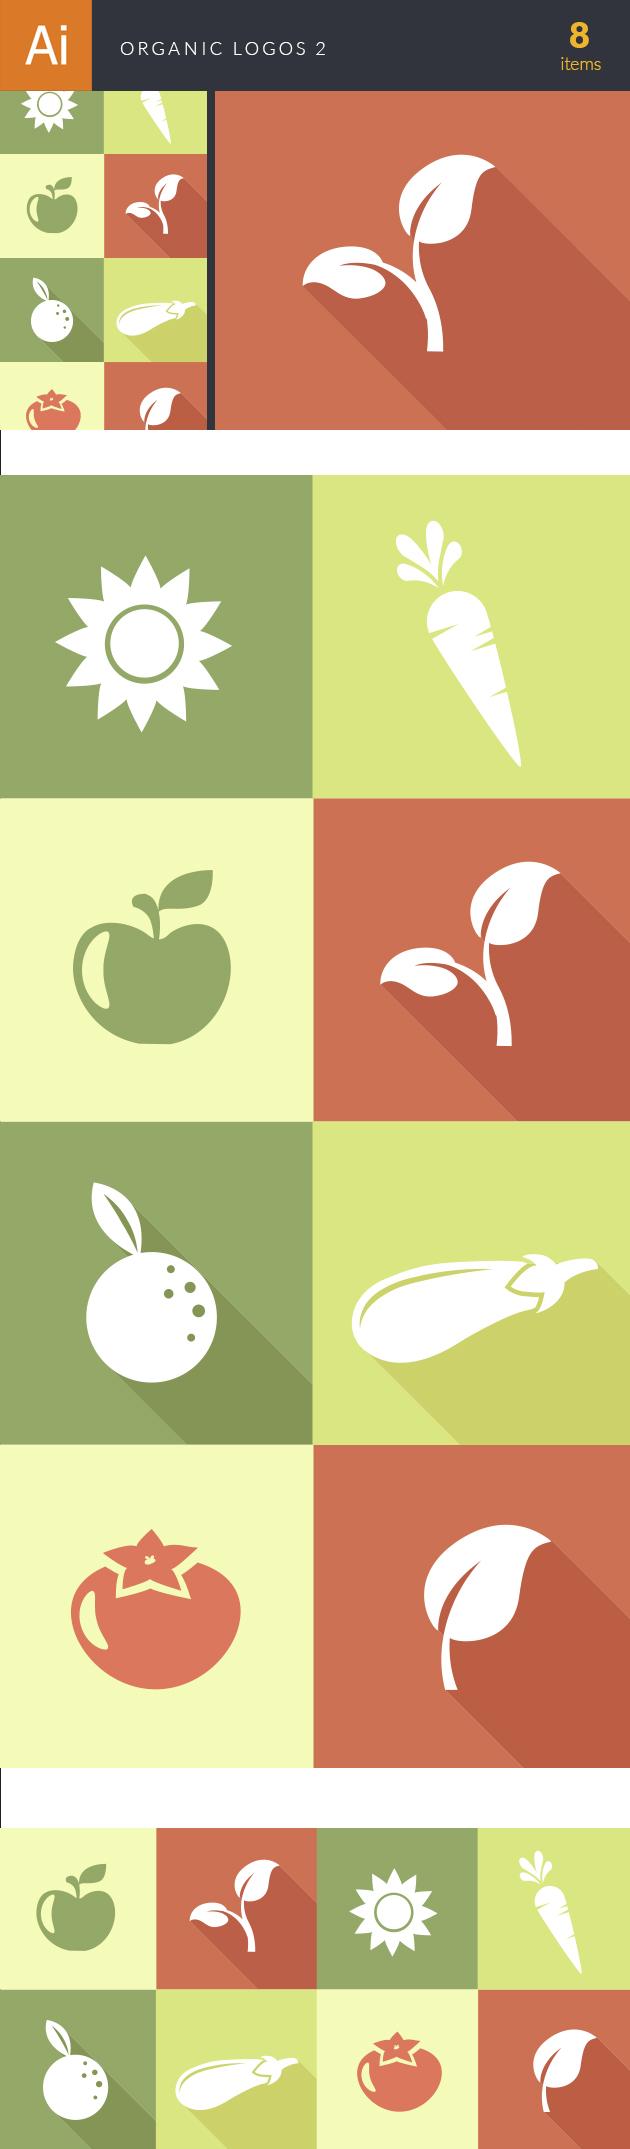 Organic Logos Vector 2 designtnt organic logos vector 2 vector large